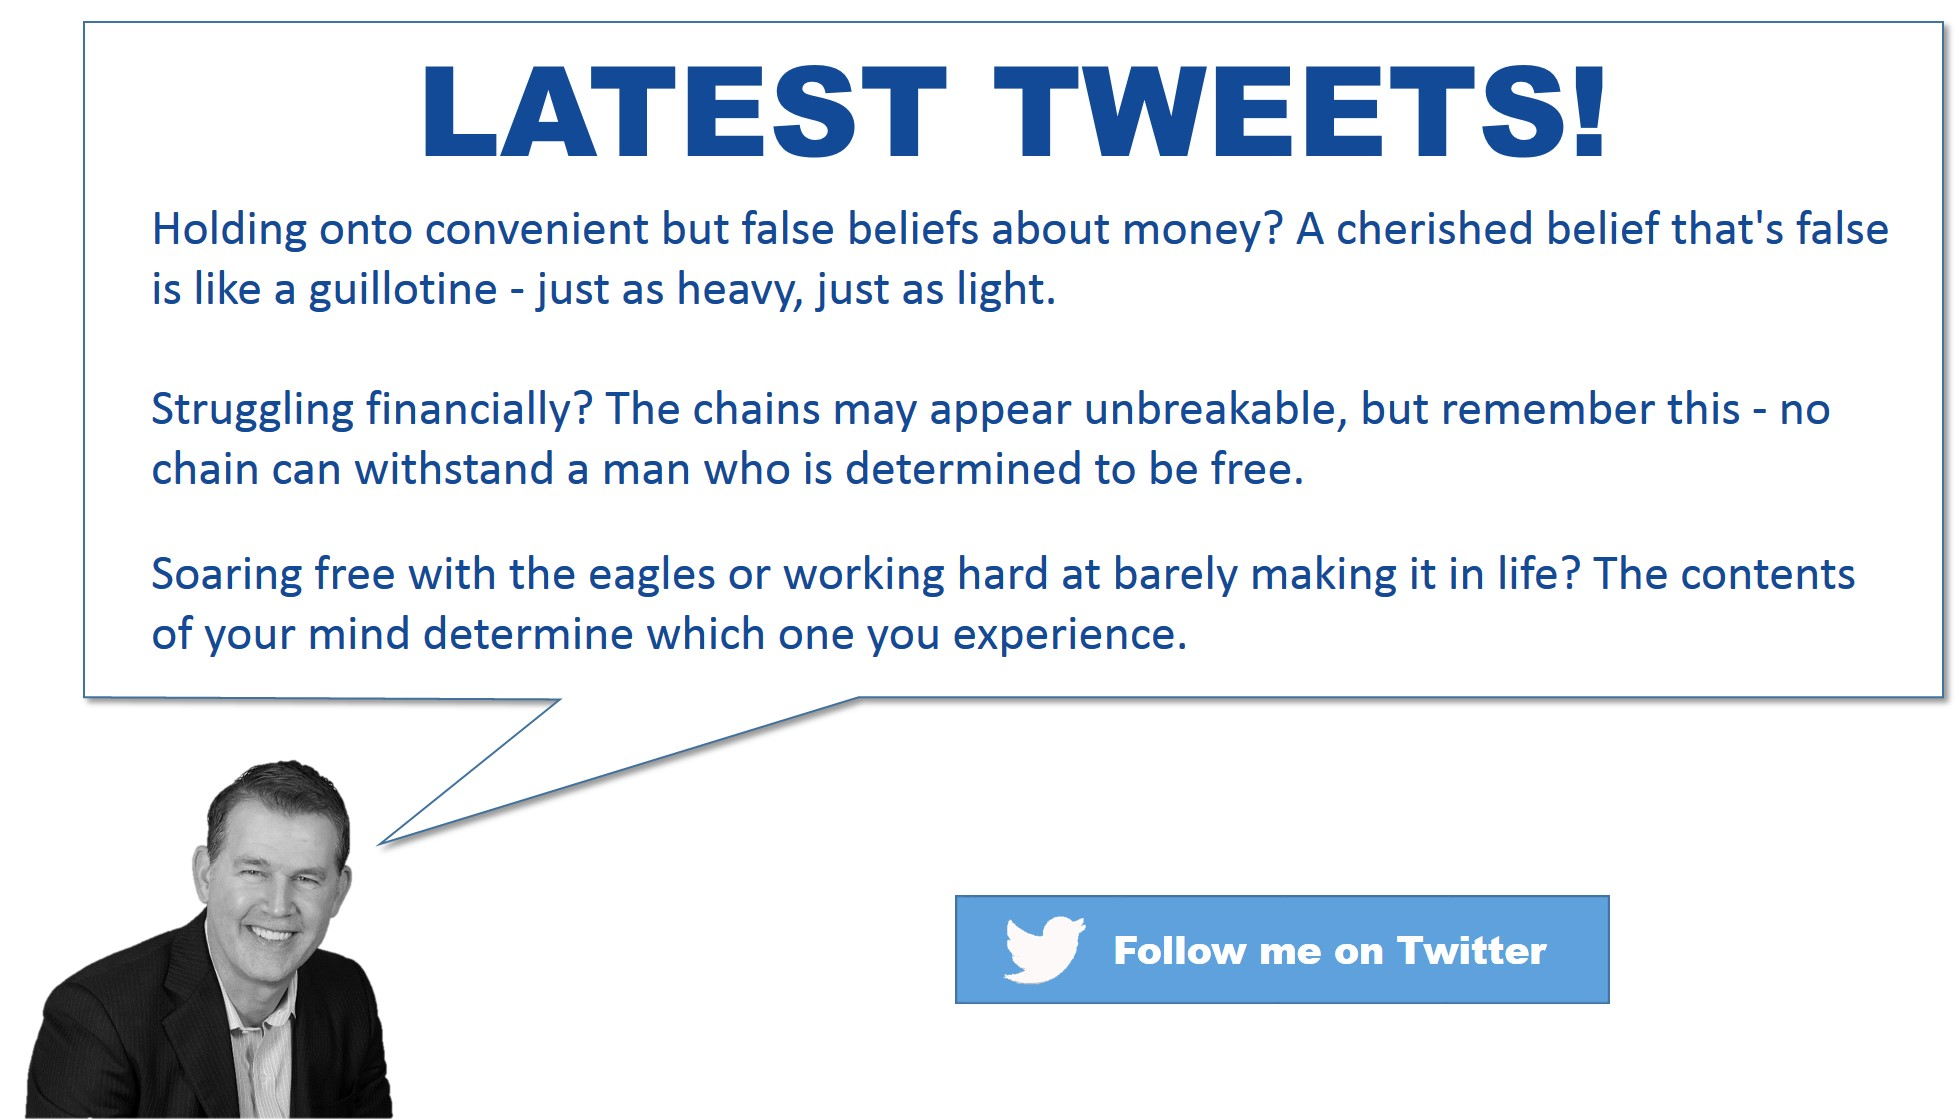 MontyCampbell-Tweets-8-26-17